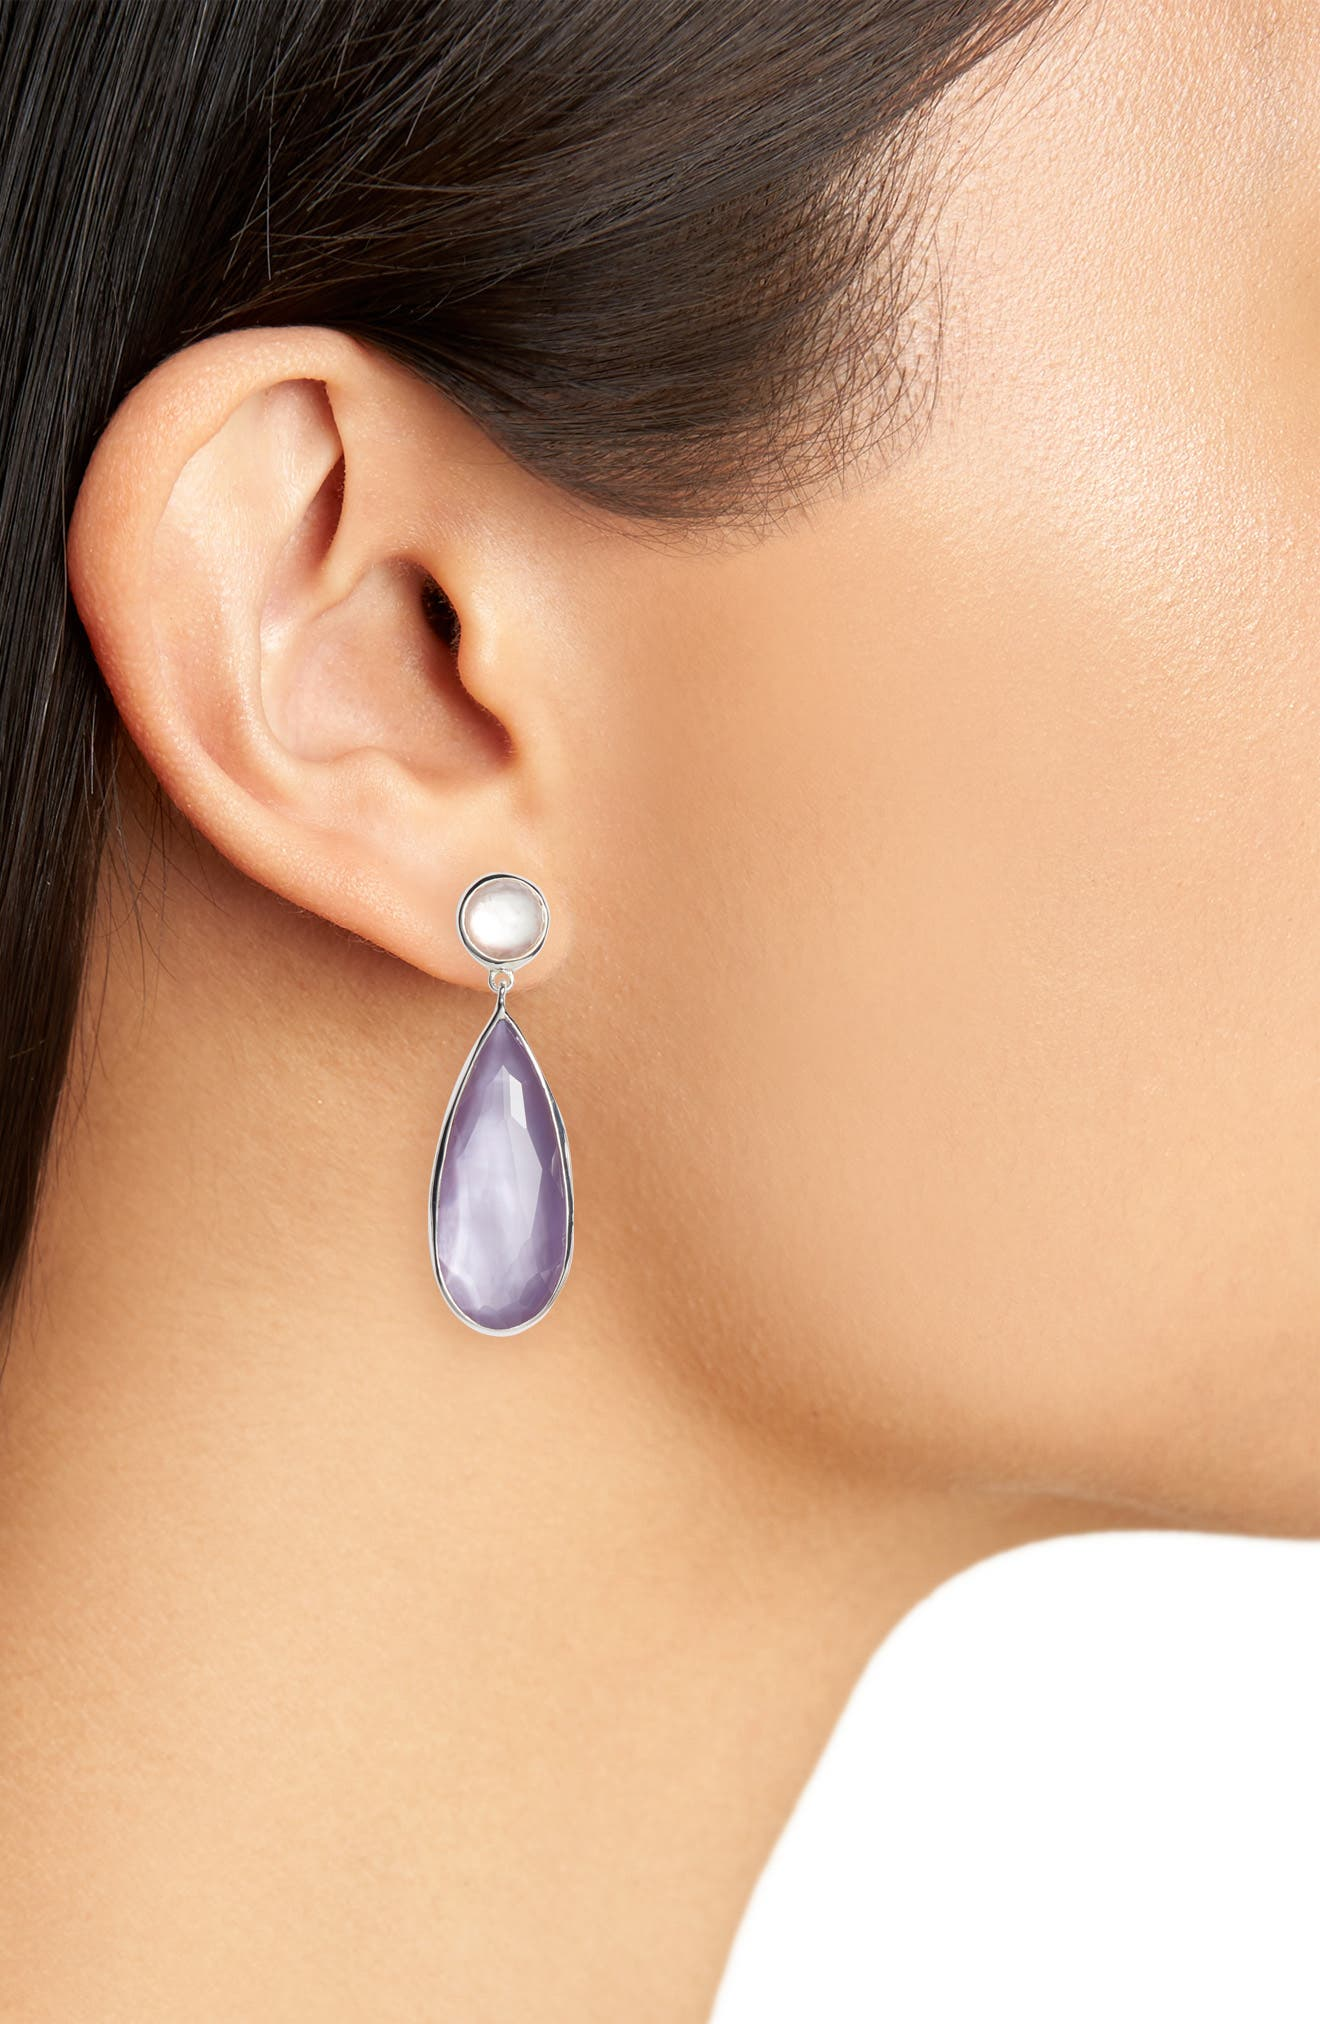 Wonderland Teardrop Earrings,                             Alternate thumbnail 2, color,                             Silver/ Primrose